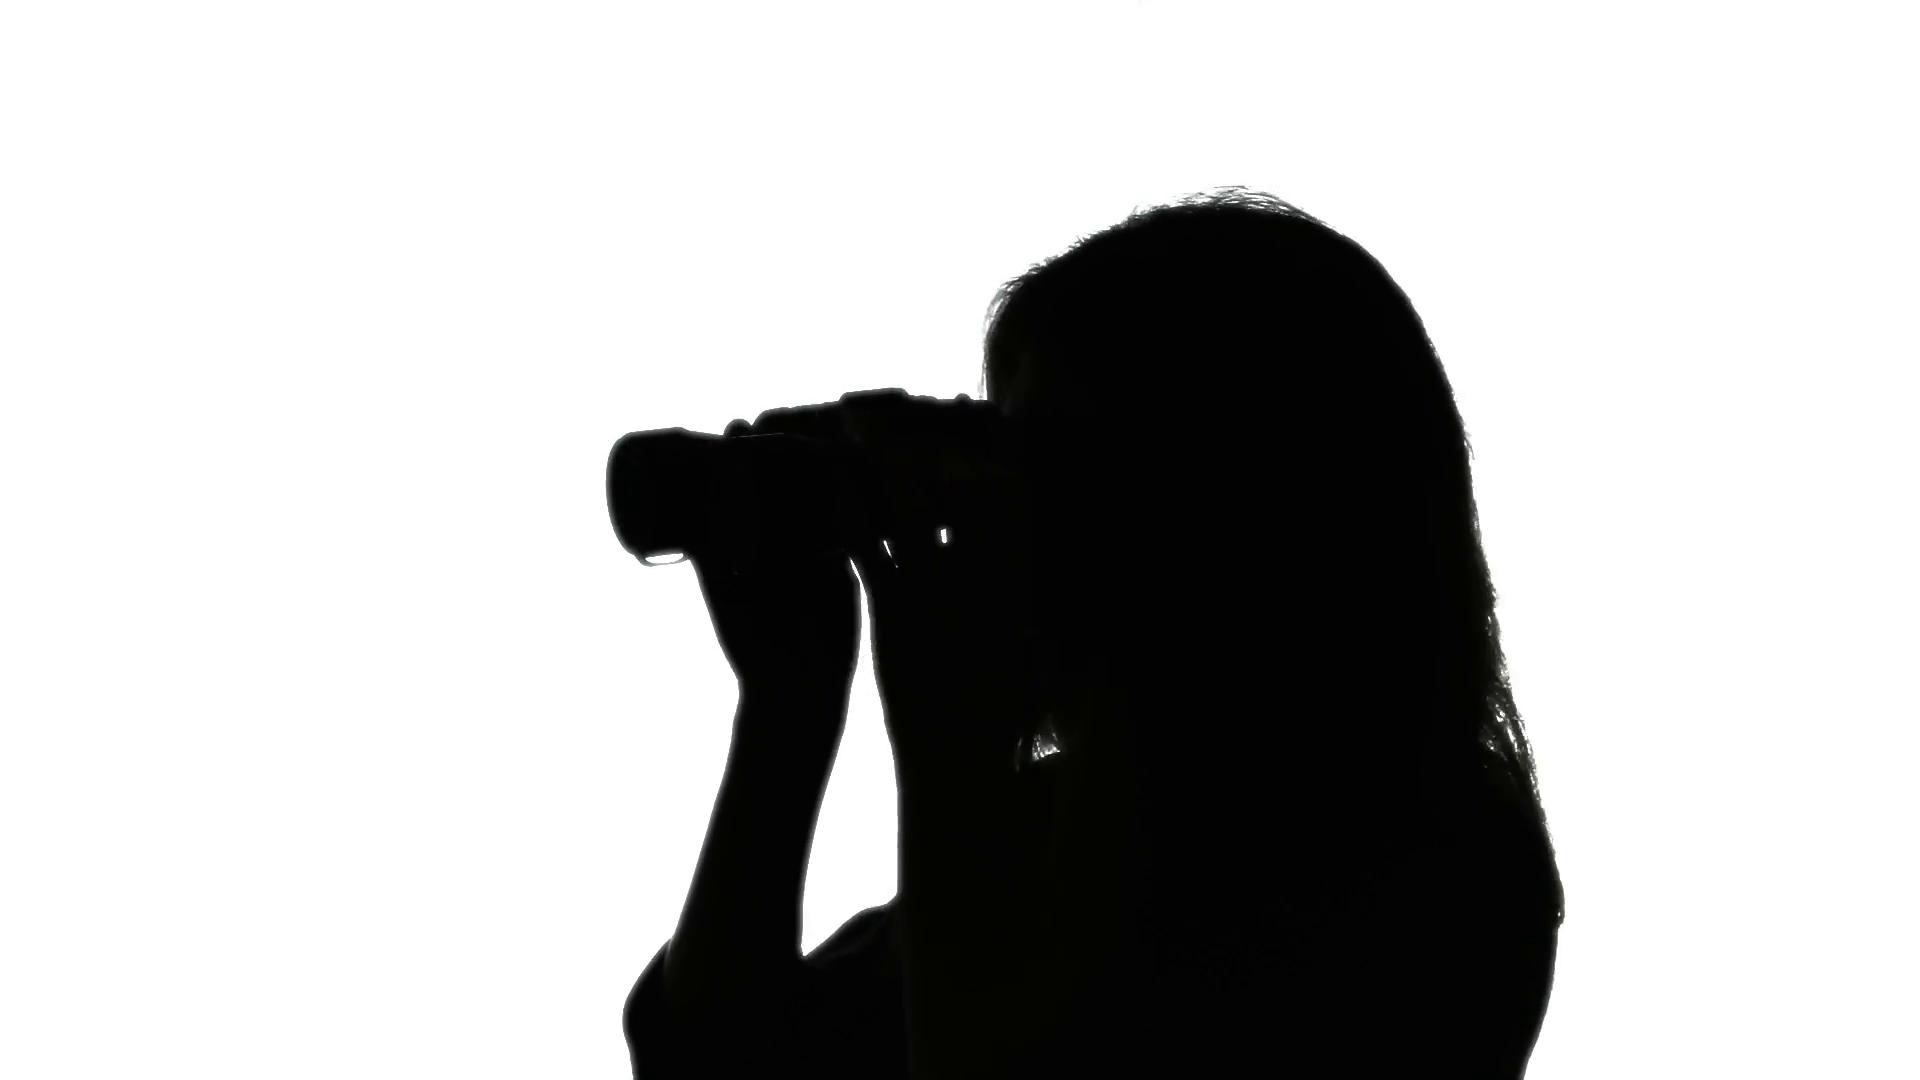 1920x1080 Silhouette Woman Binoculars 1. Woman Lookinground Through